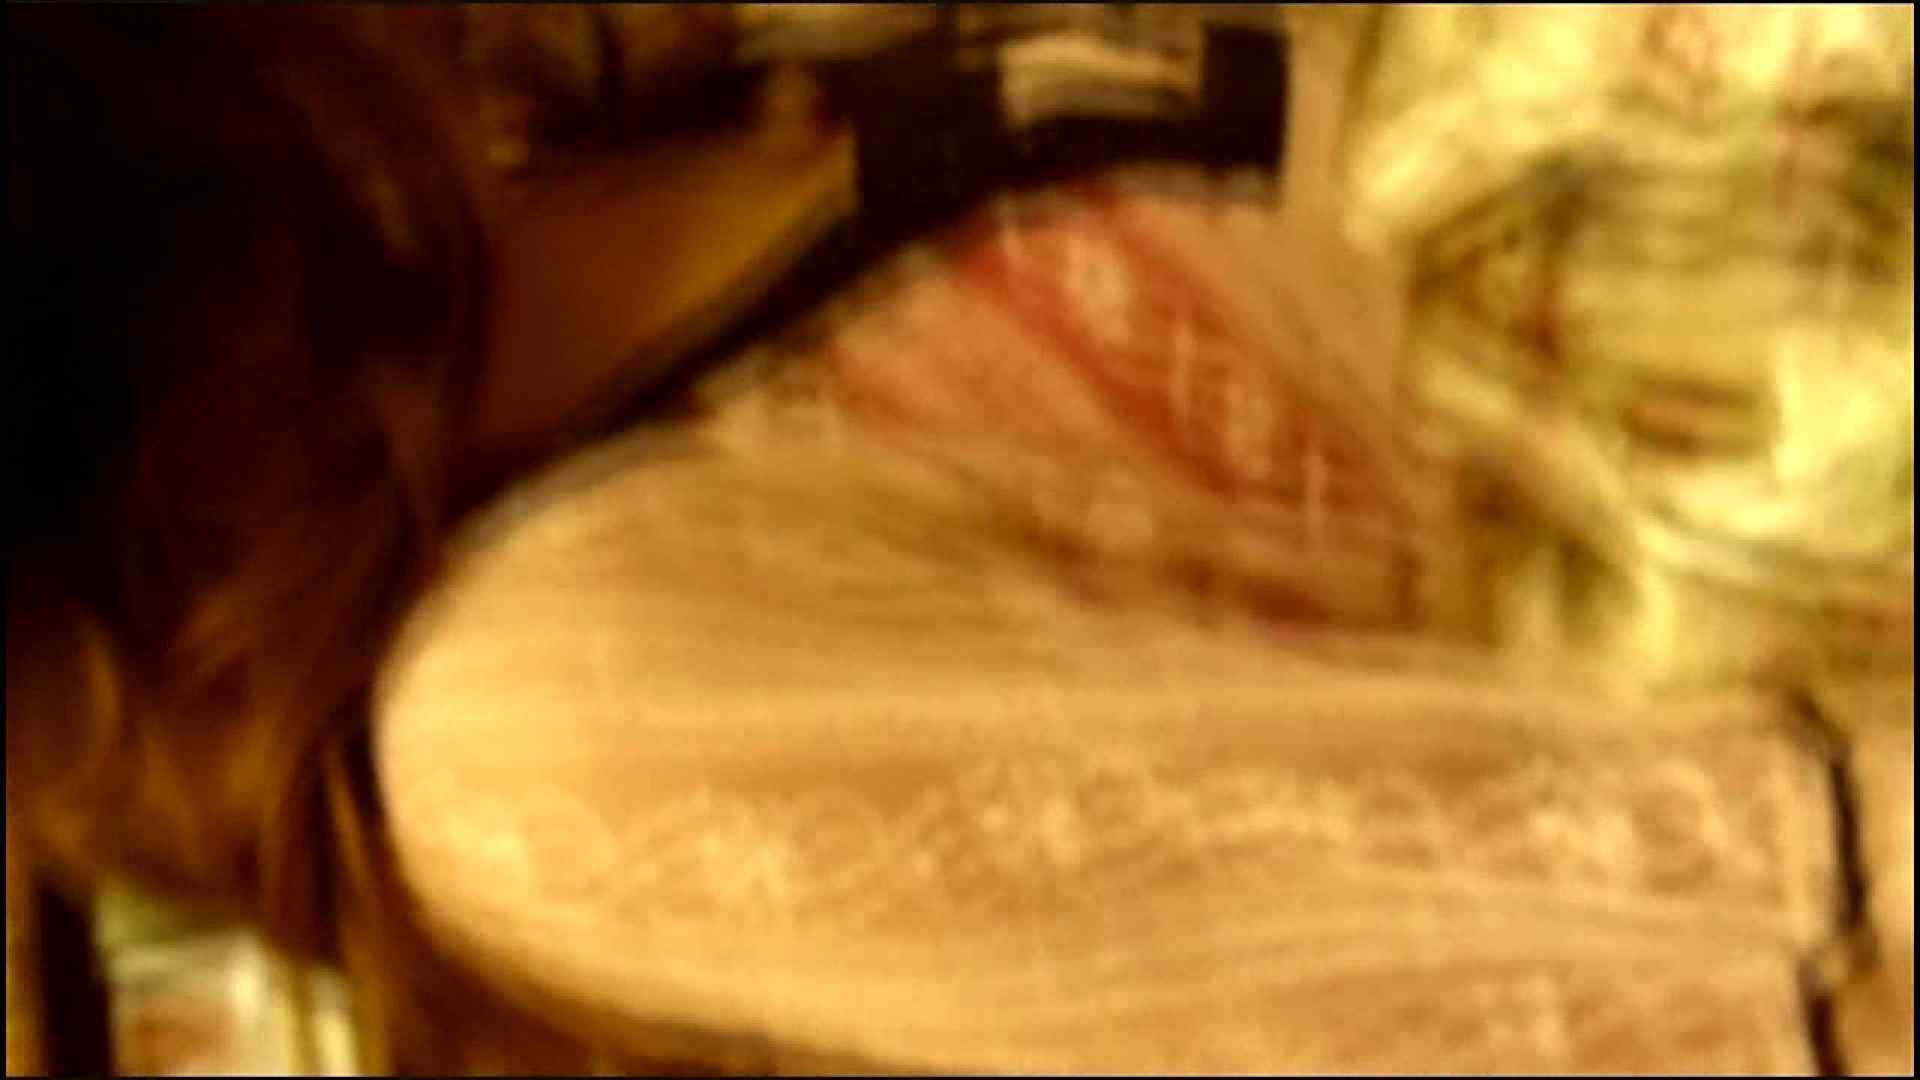 NO.2 本屋にいた巨乳ギャル 巨乳 濡れ場動画紹介 95枚 6